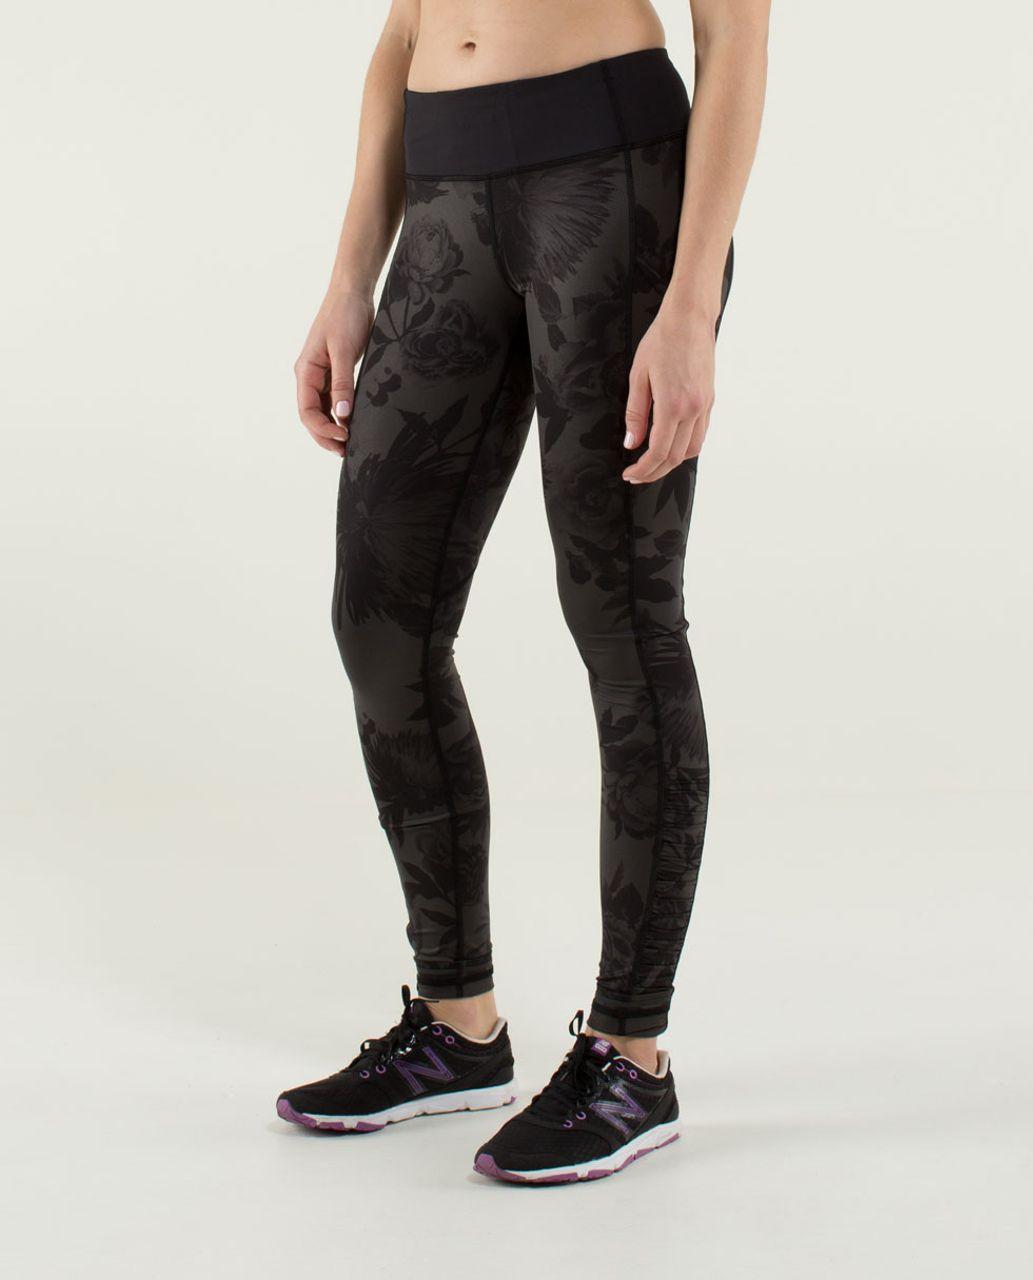 Lululemon Speed Tight *Luxtreme - Brisk Bloom Black Soot / Black